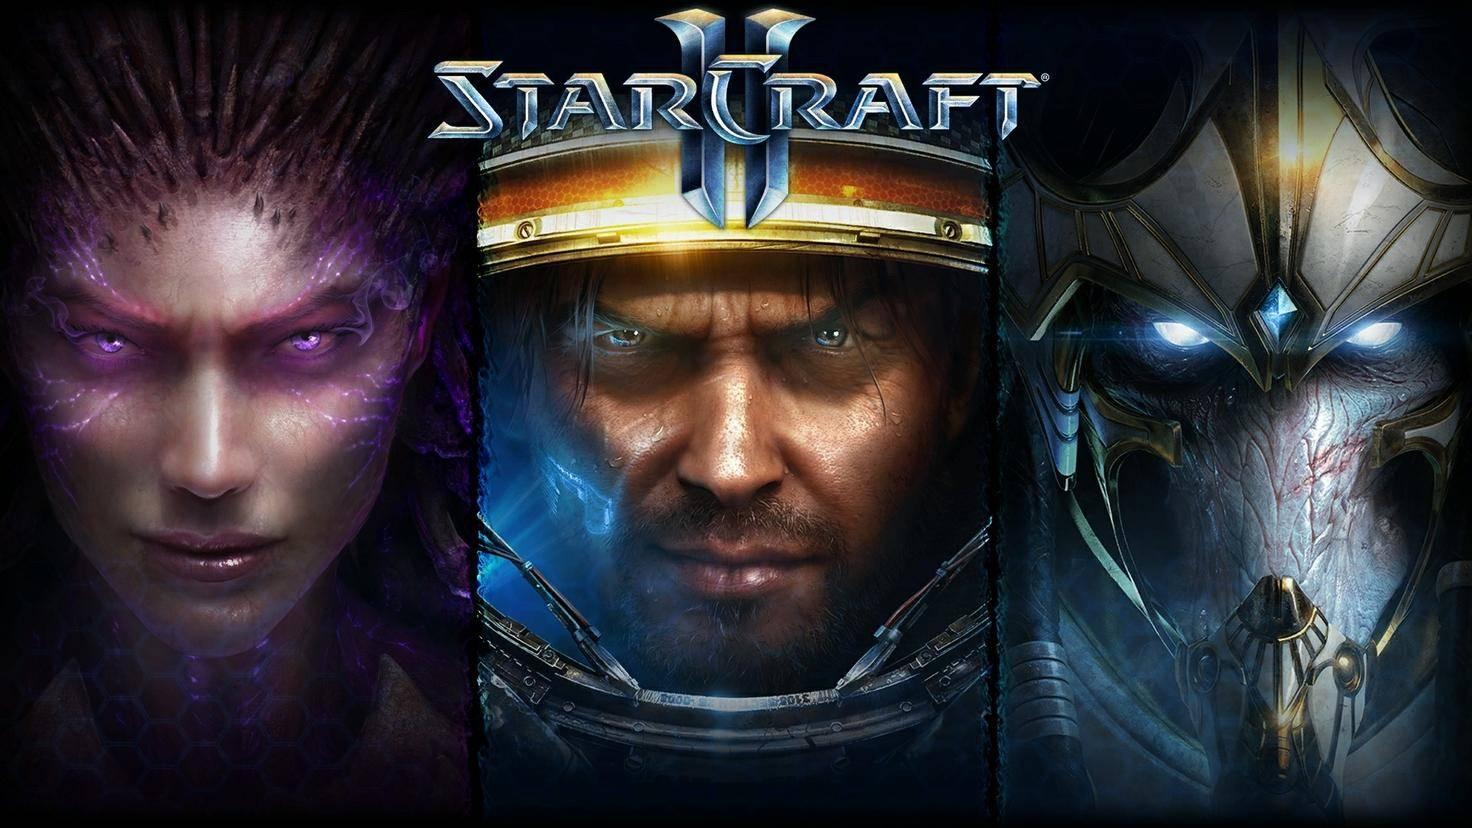 starcraft-2-login-screen